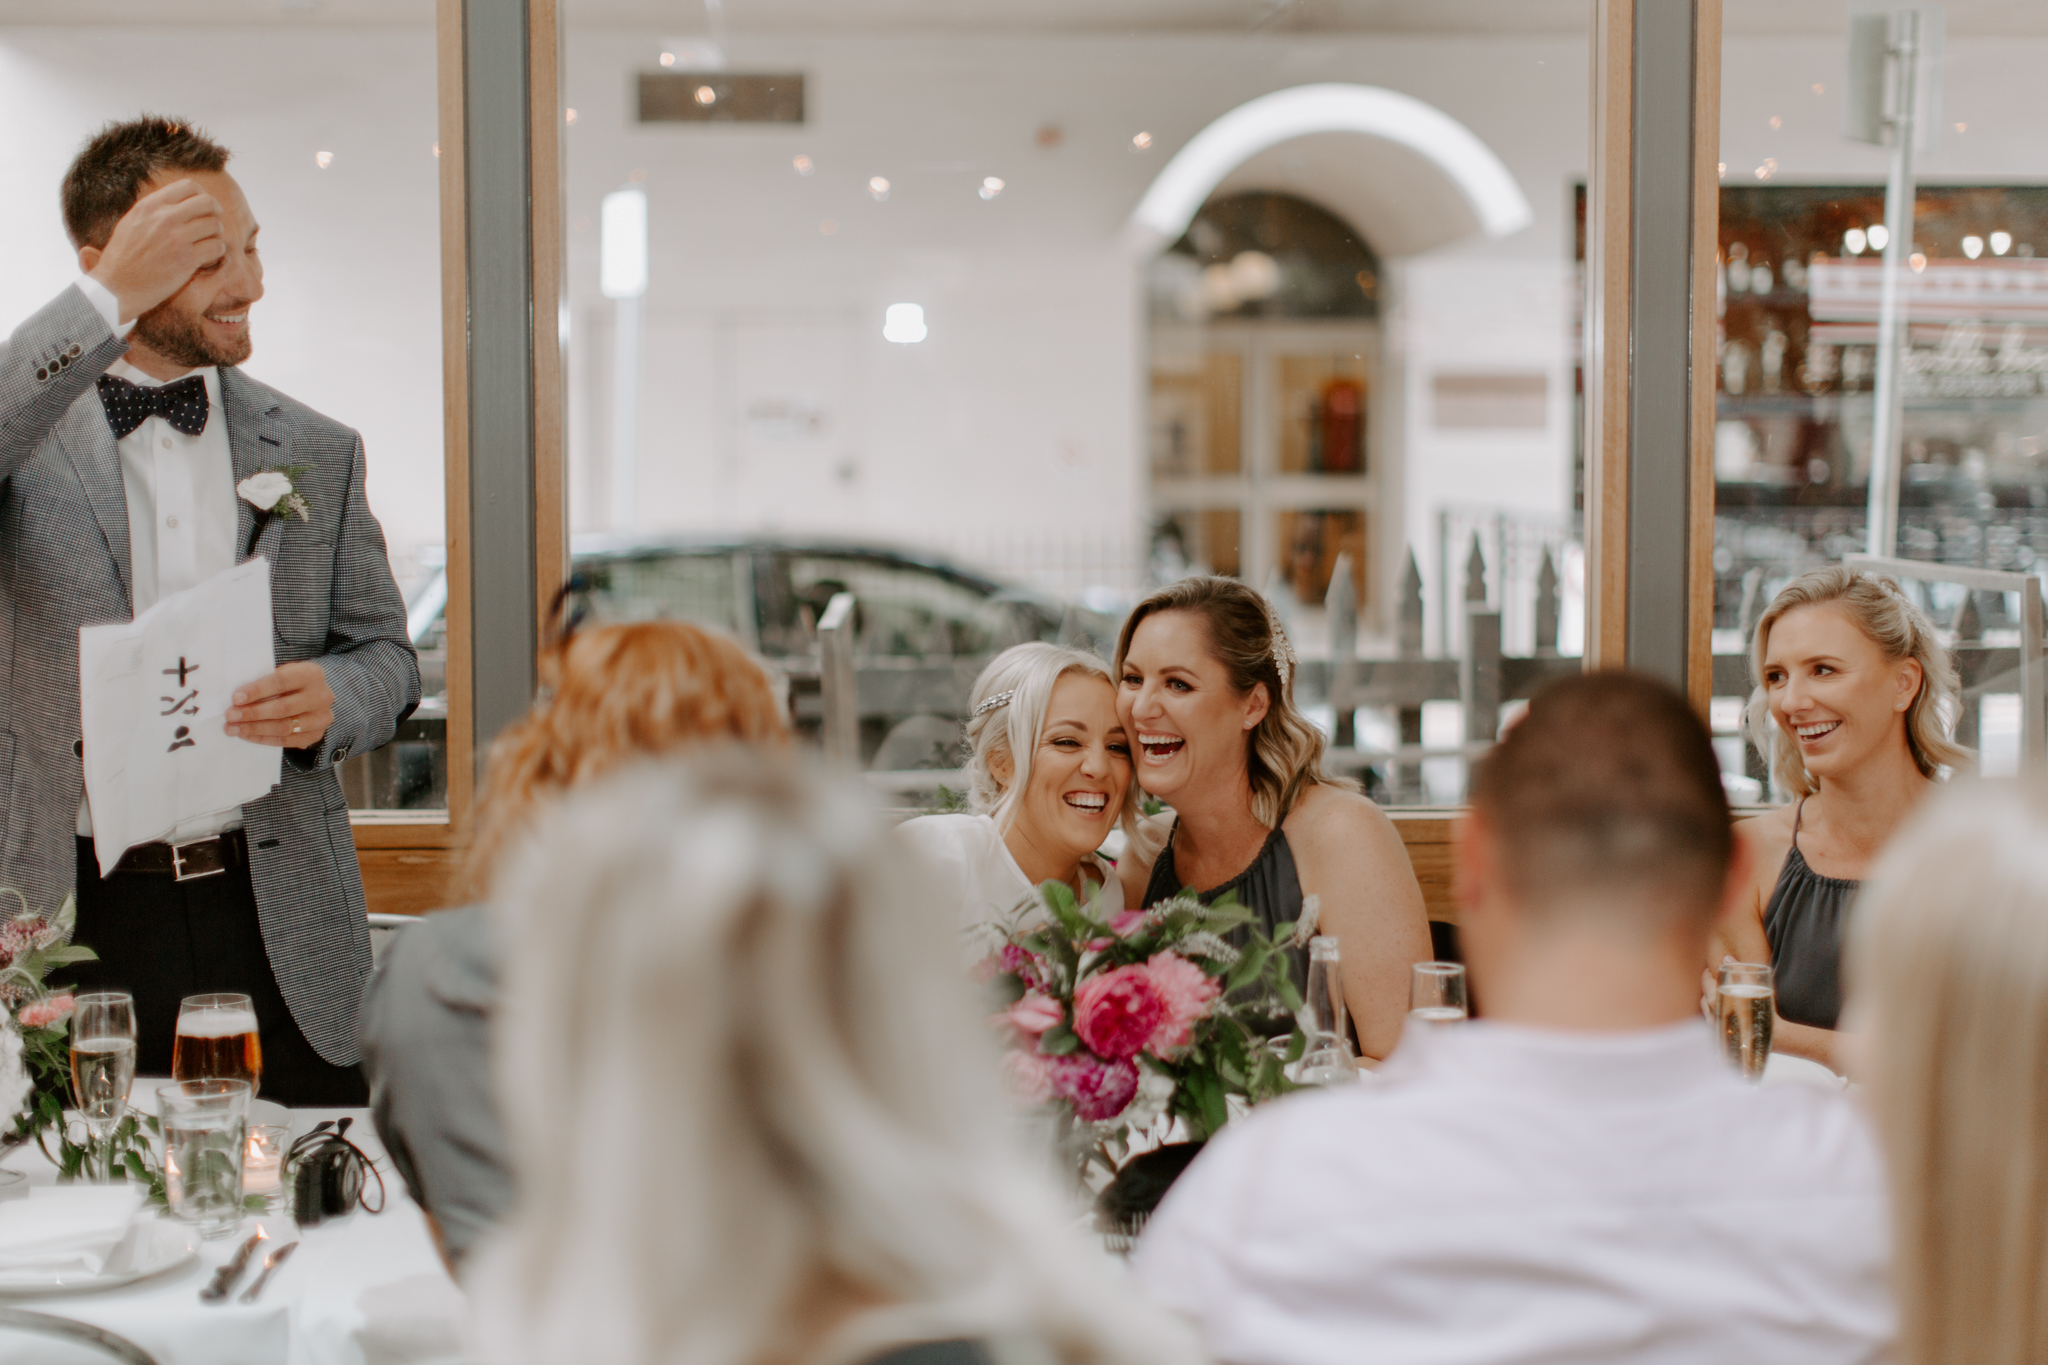 Trunk-restaurant-wedding-EmotionsandMath-070.jpg